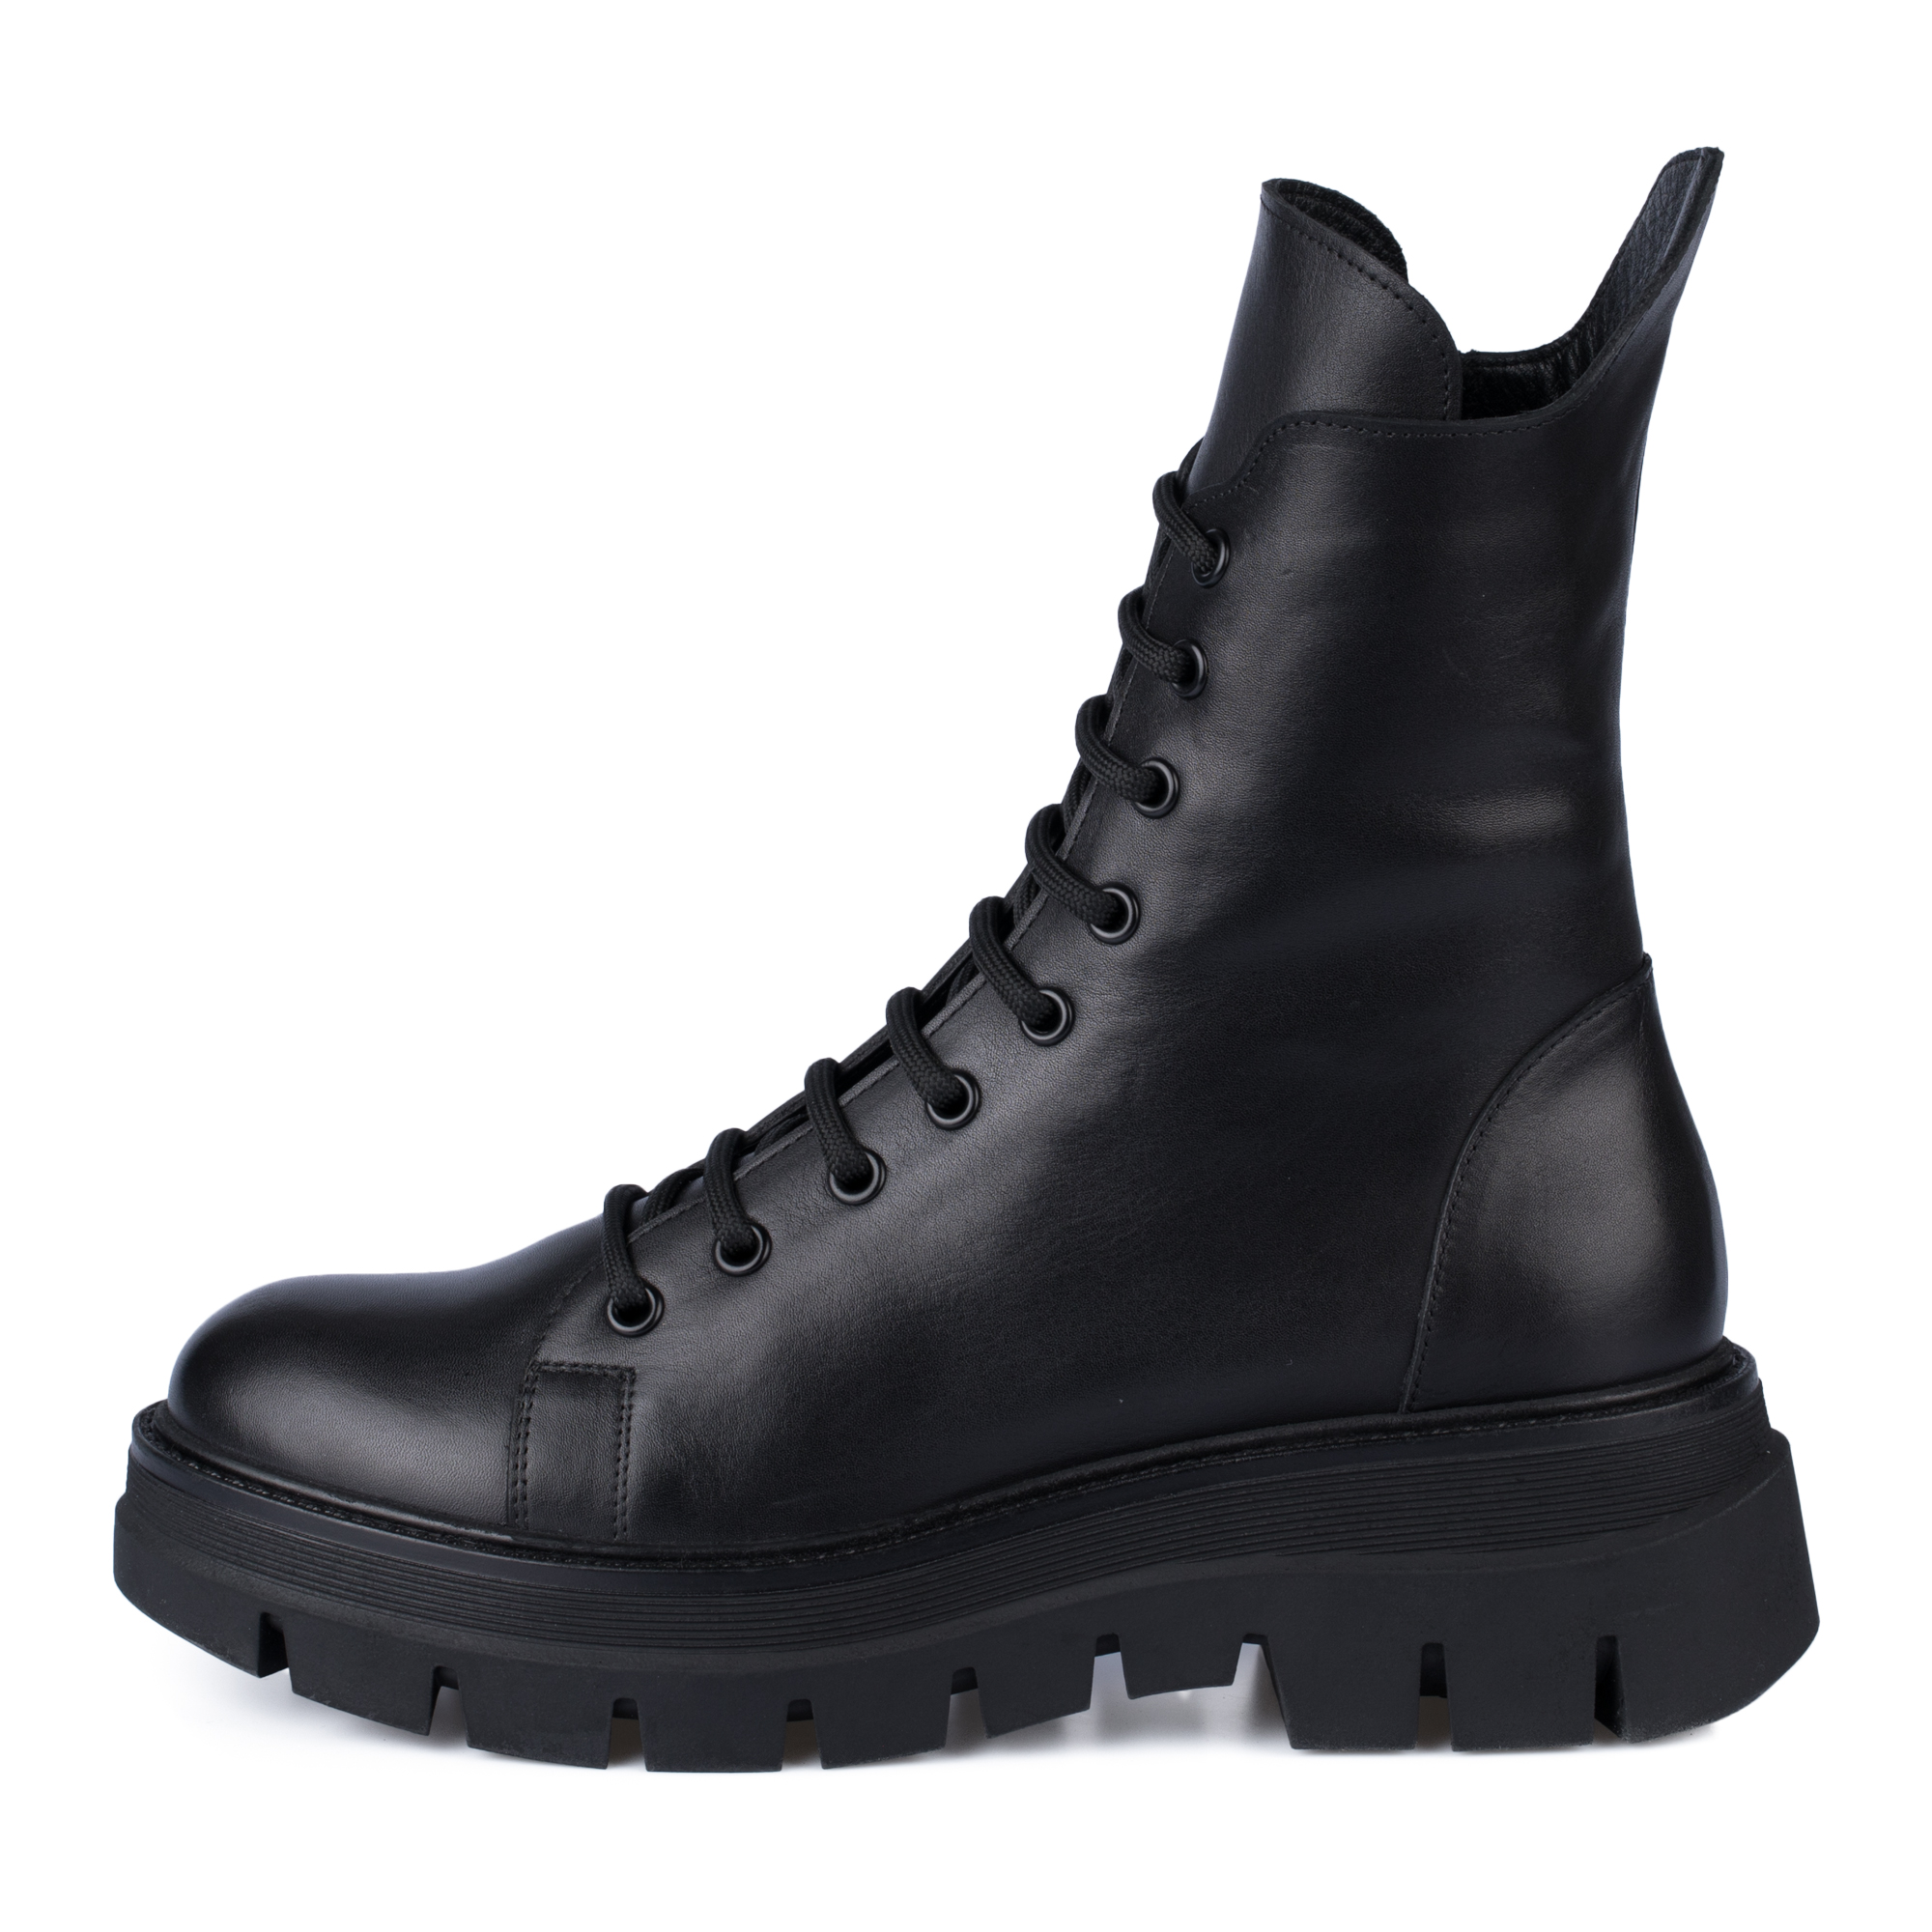 Ботинки Thomas Munz 539-021C-2102